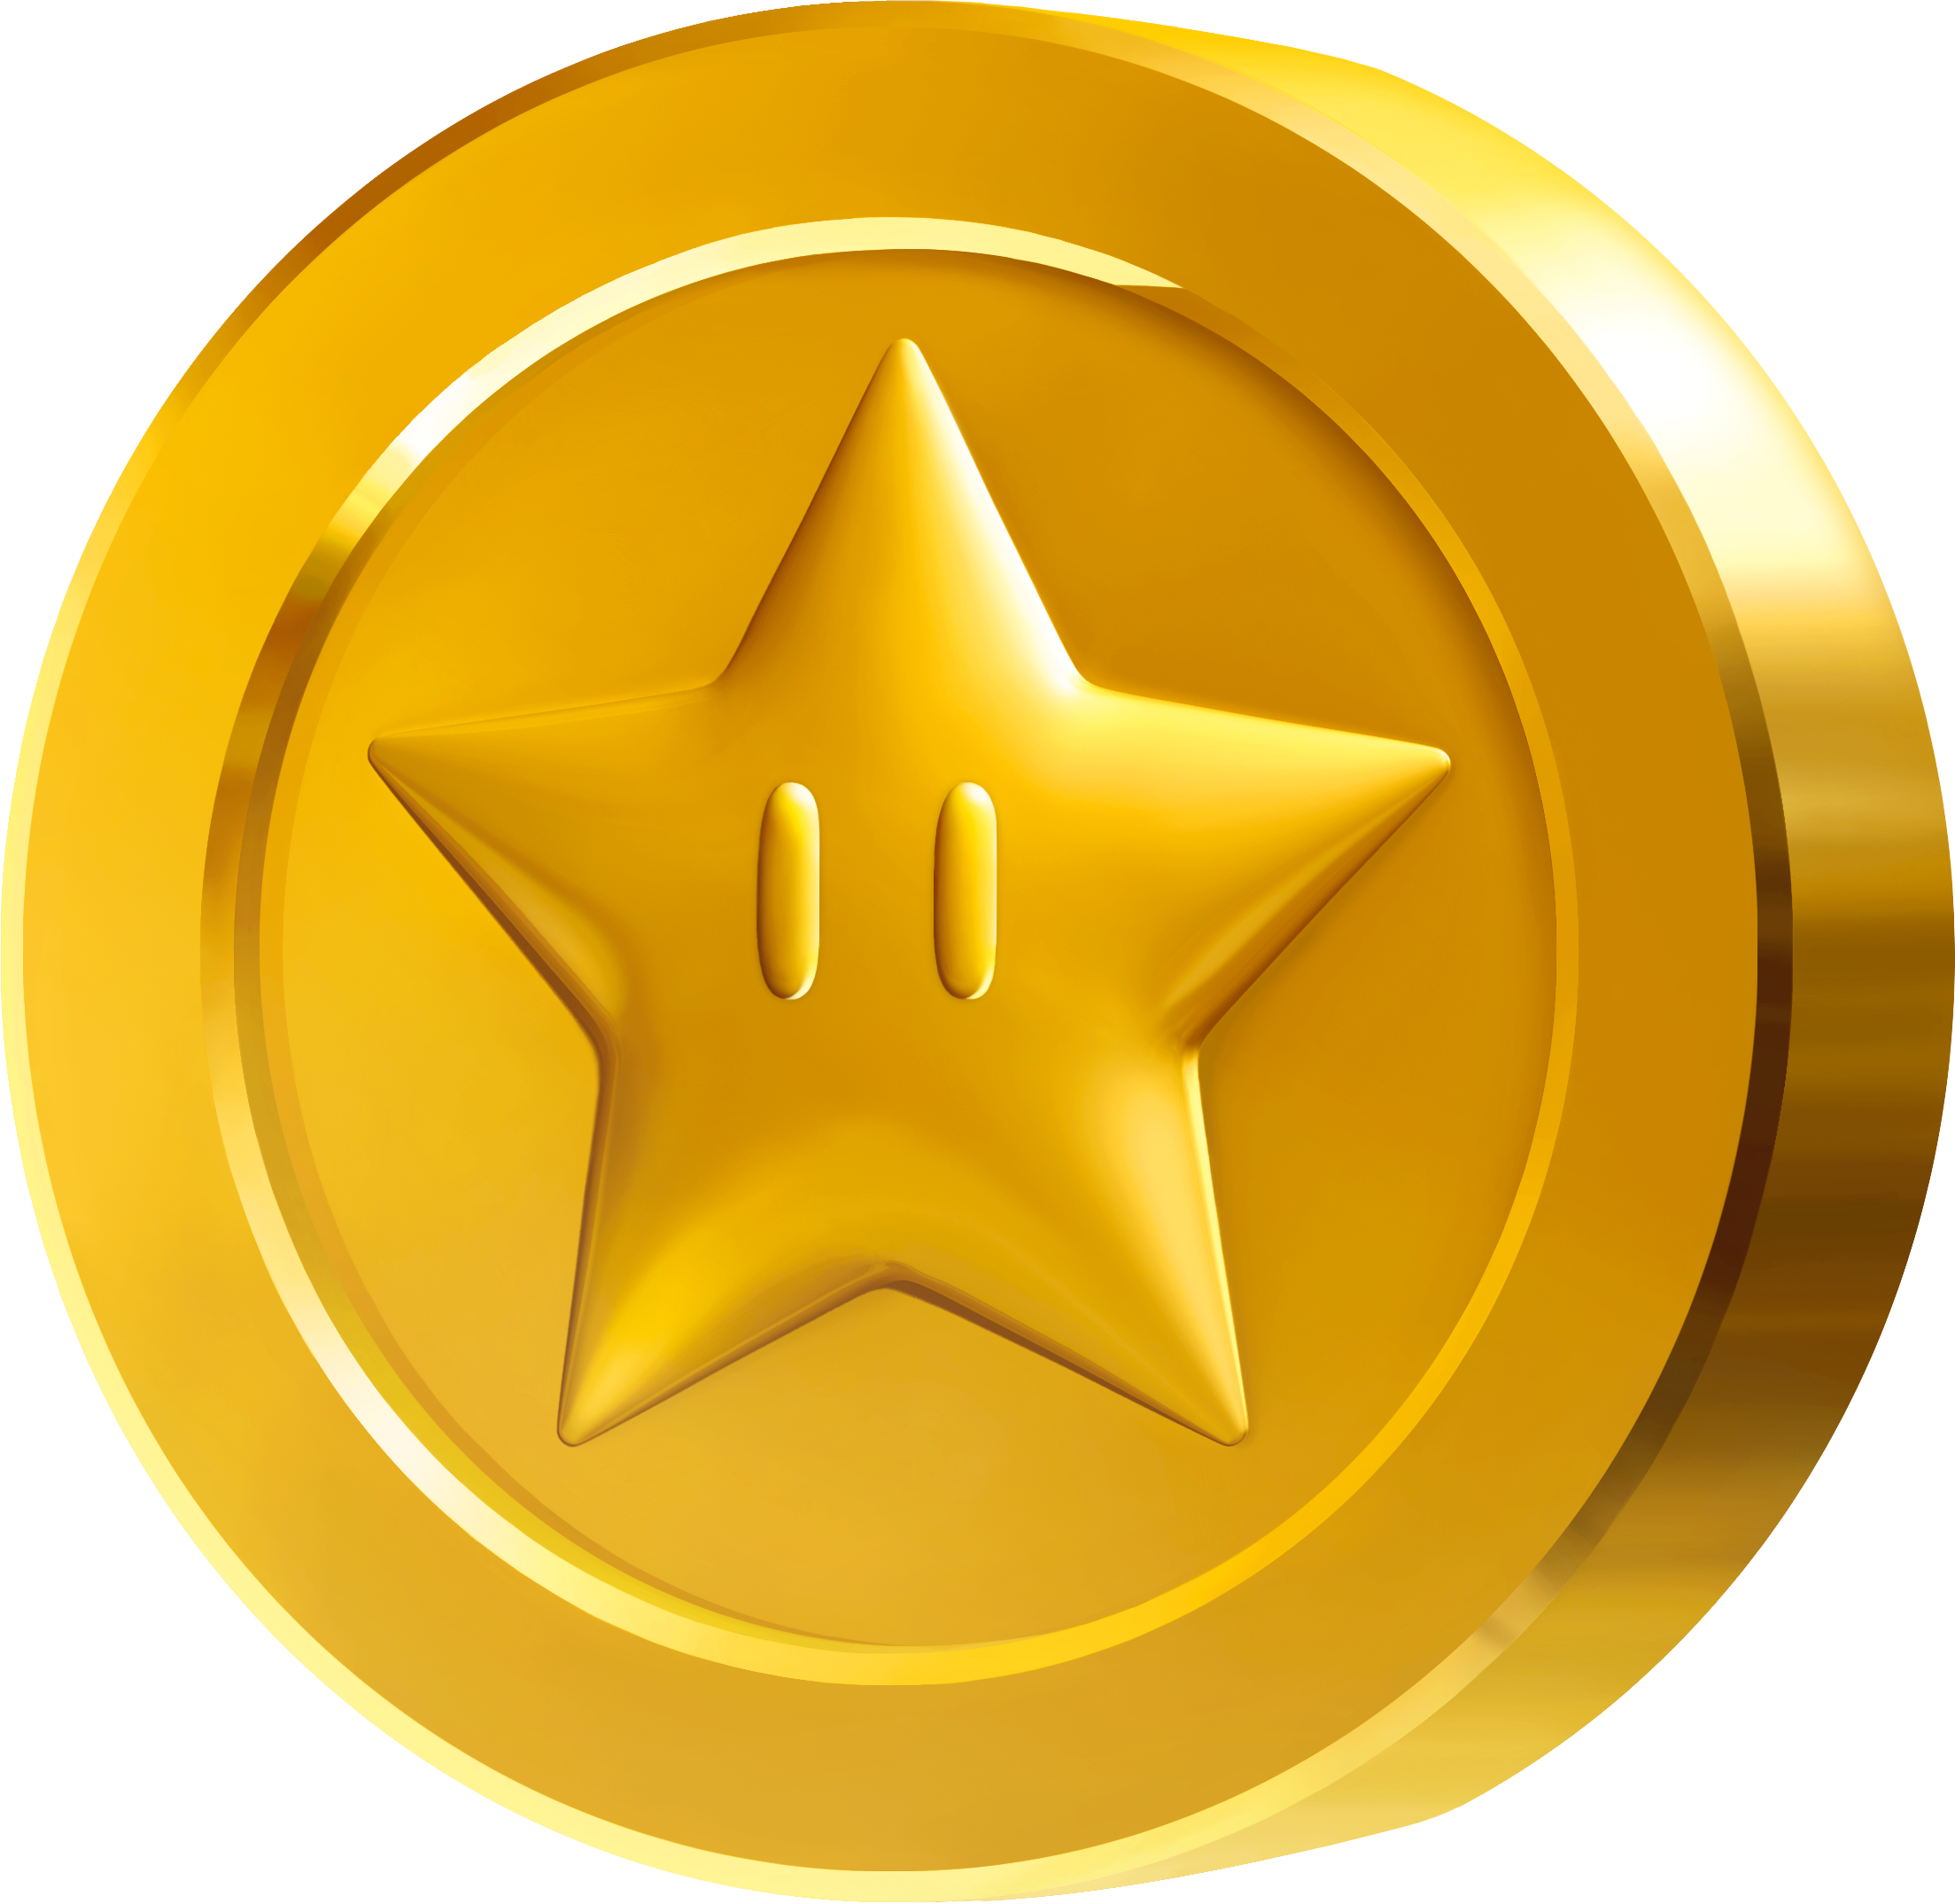 Mario star clipart png image freeuse stock imagenes de mario bros monedas - Buscar con Google | imagenes varias ... image freeuse stock